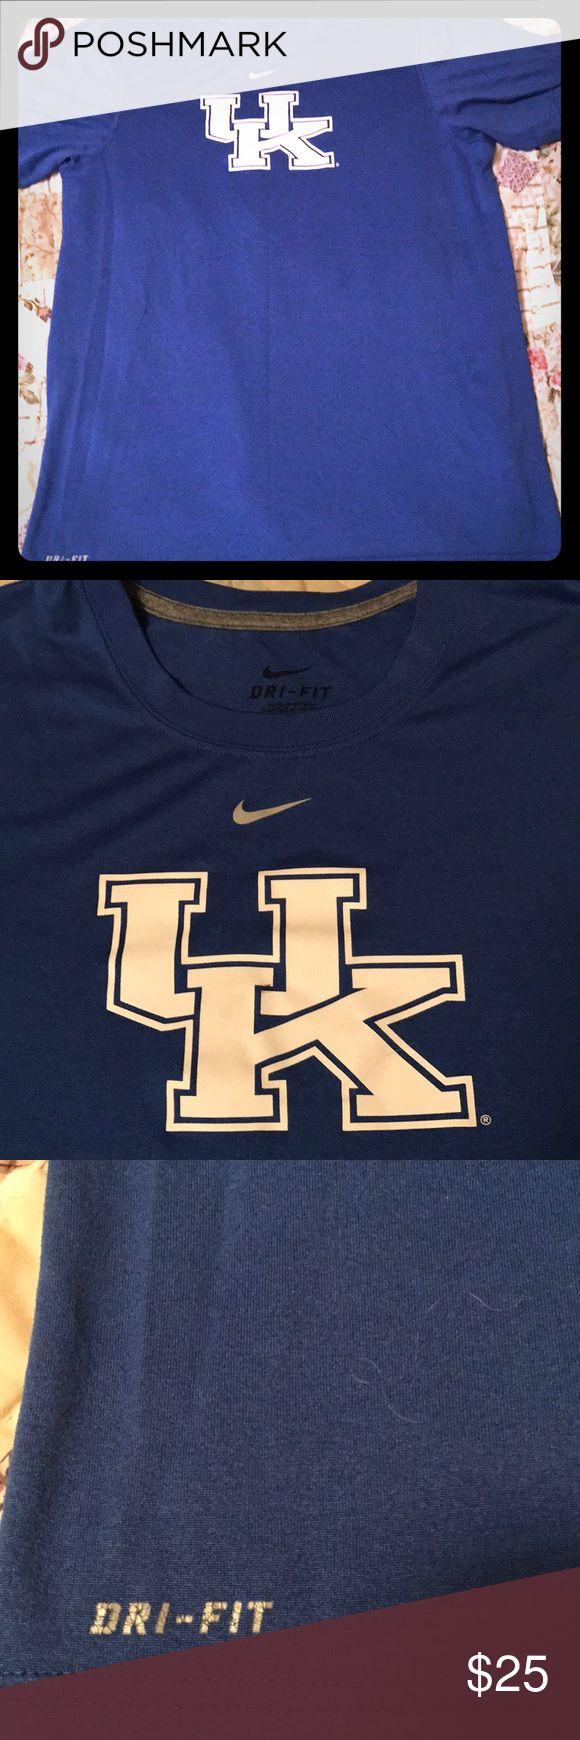 UK Nike Dri fit University of Kentucky Nike Dri Fit Sz men's small. No defects. Nike Shirts Tees - Short Sleeve